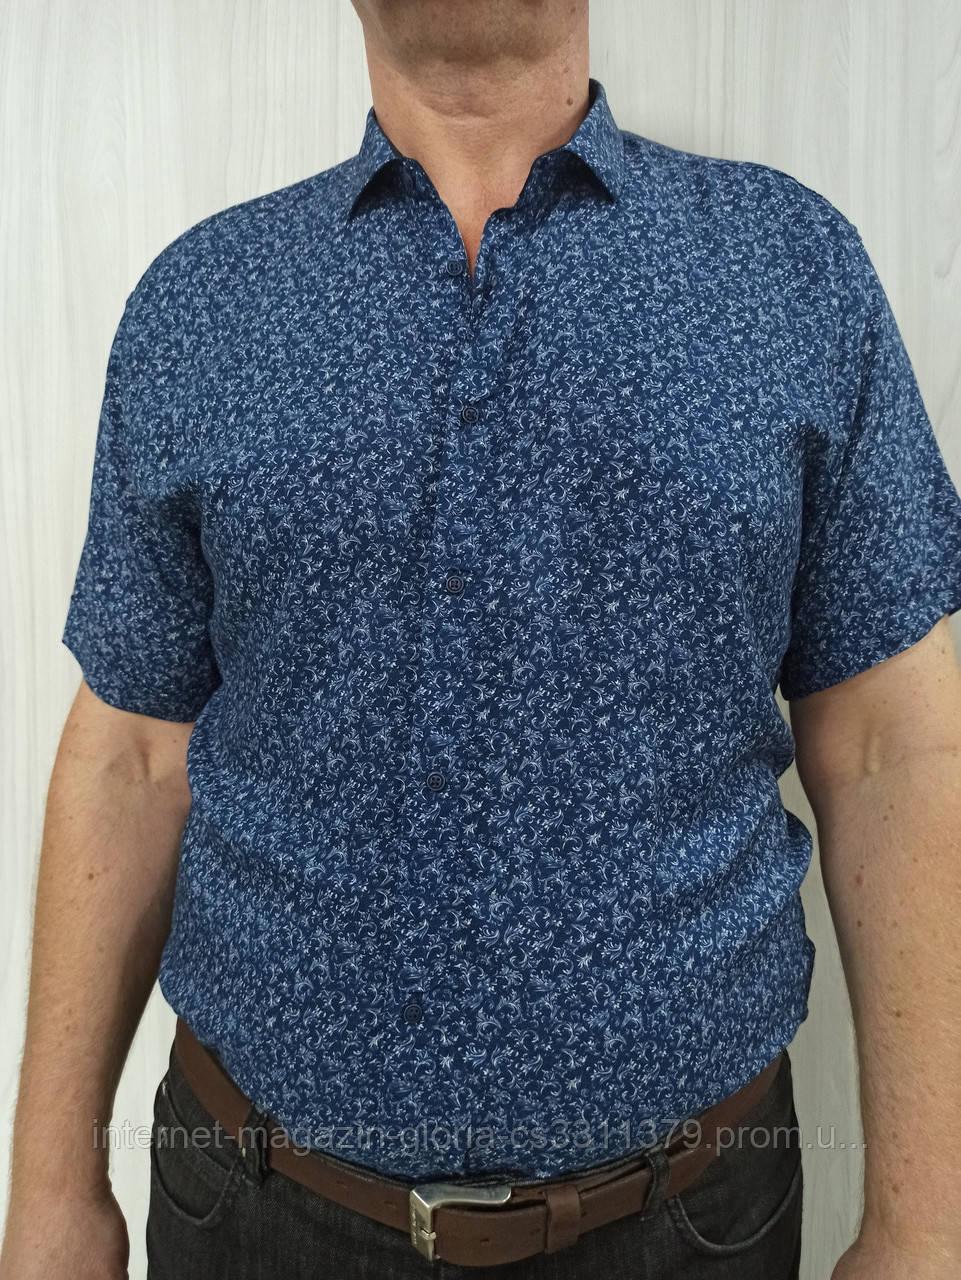 Мужская рубашка FLP. mod.47005. Размеры: 3XL,4L,5XL,6XL  Батал.